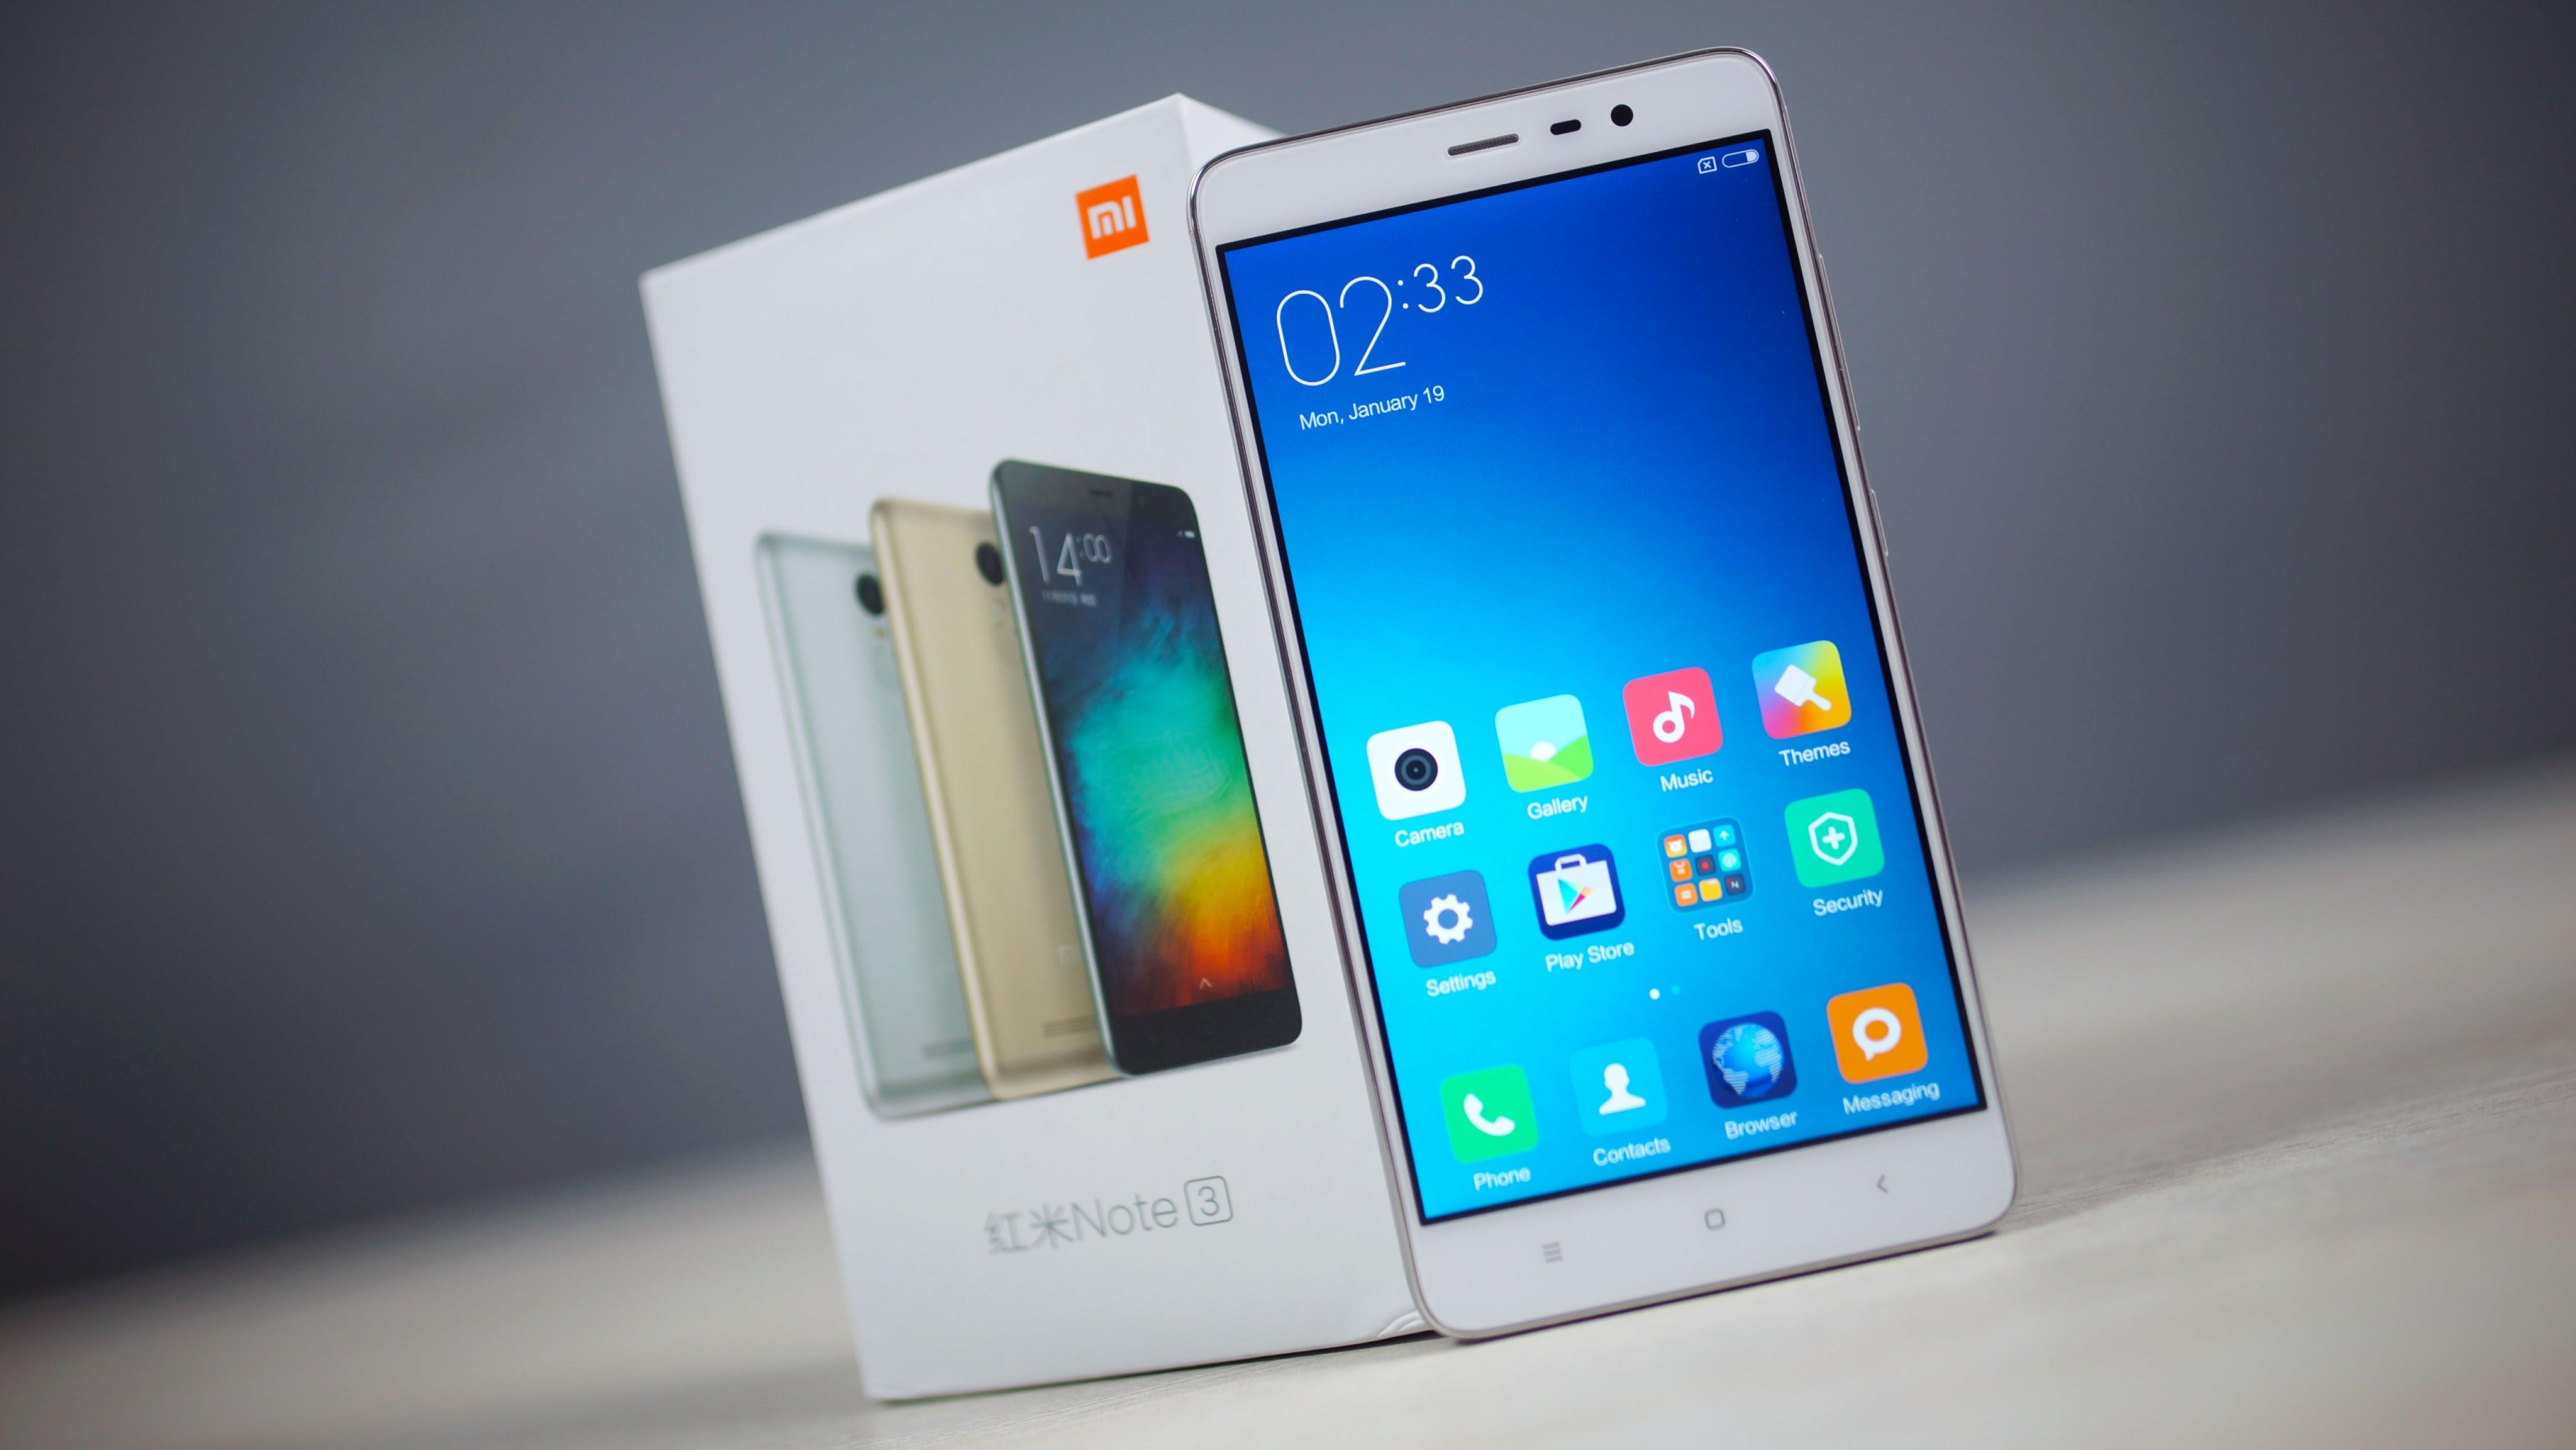 Offerte Smartphone Xiaomi Con GearBest Sconti A Partire